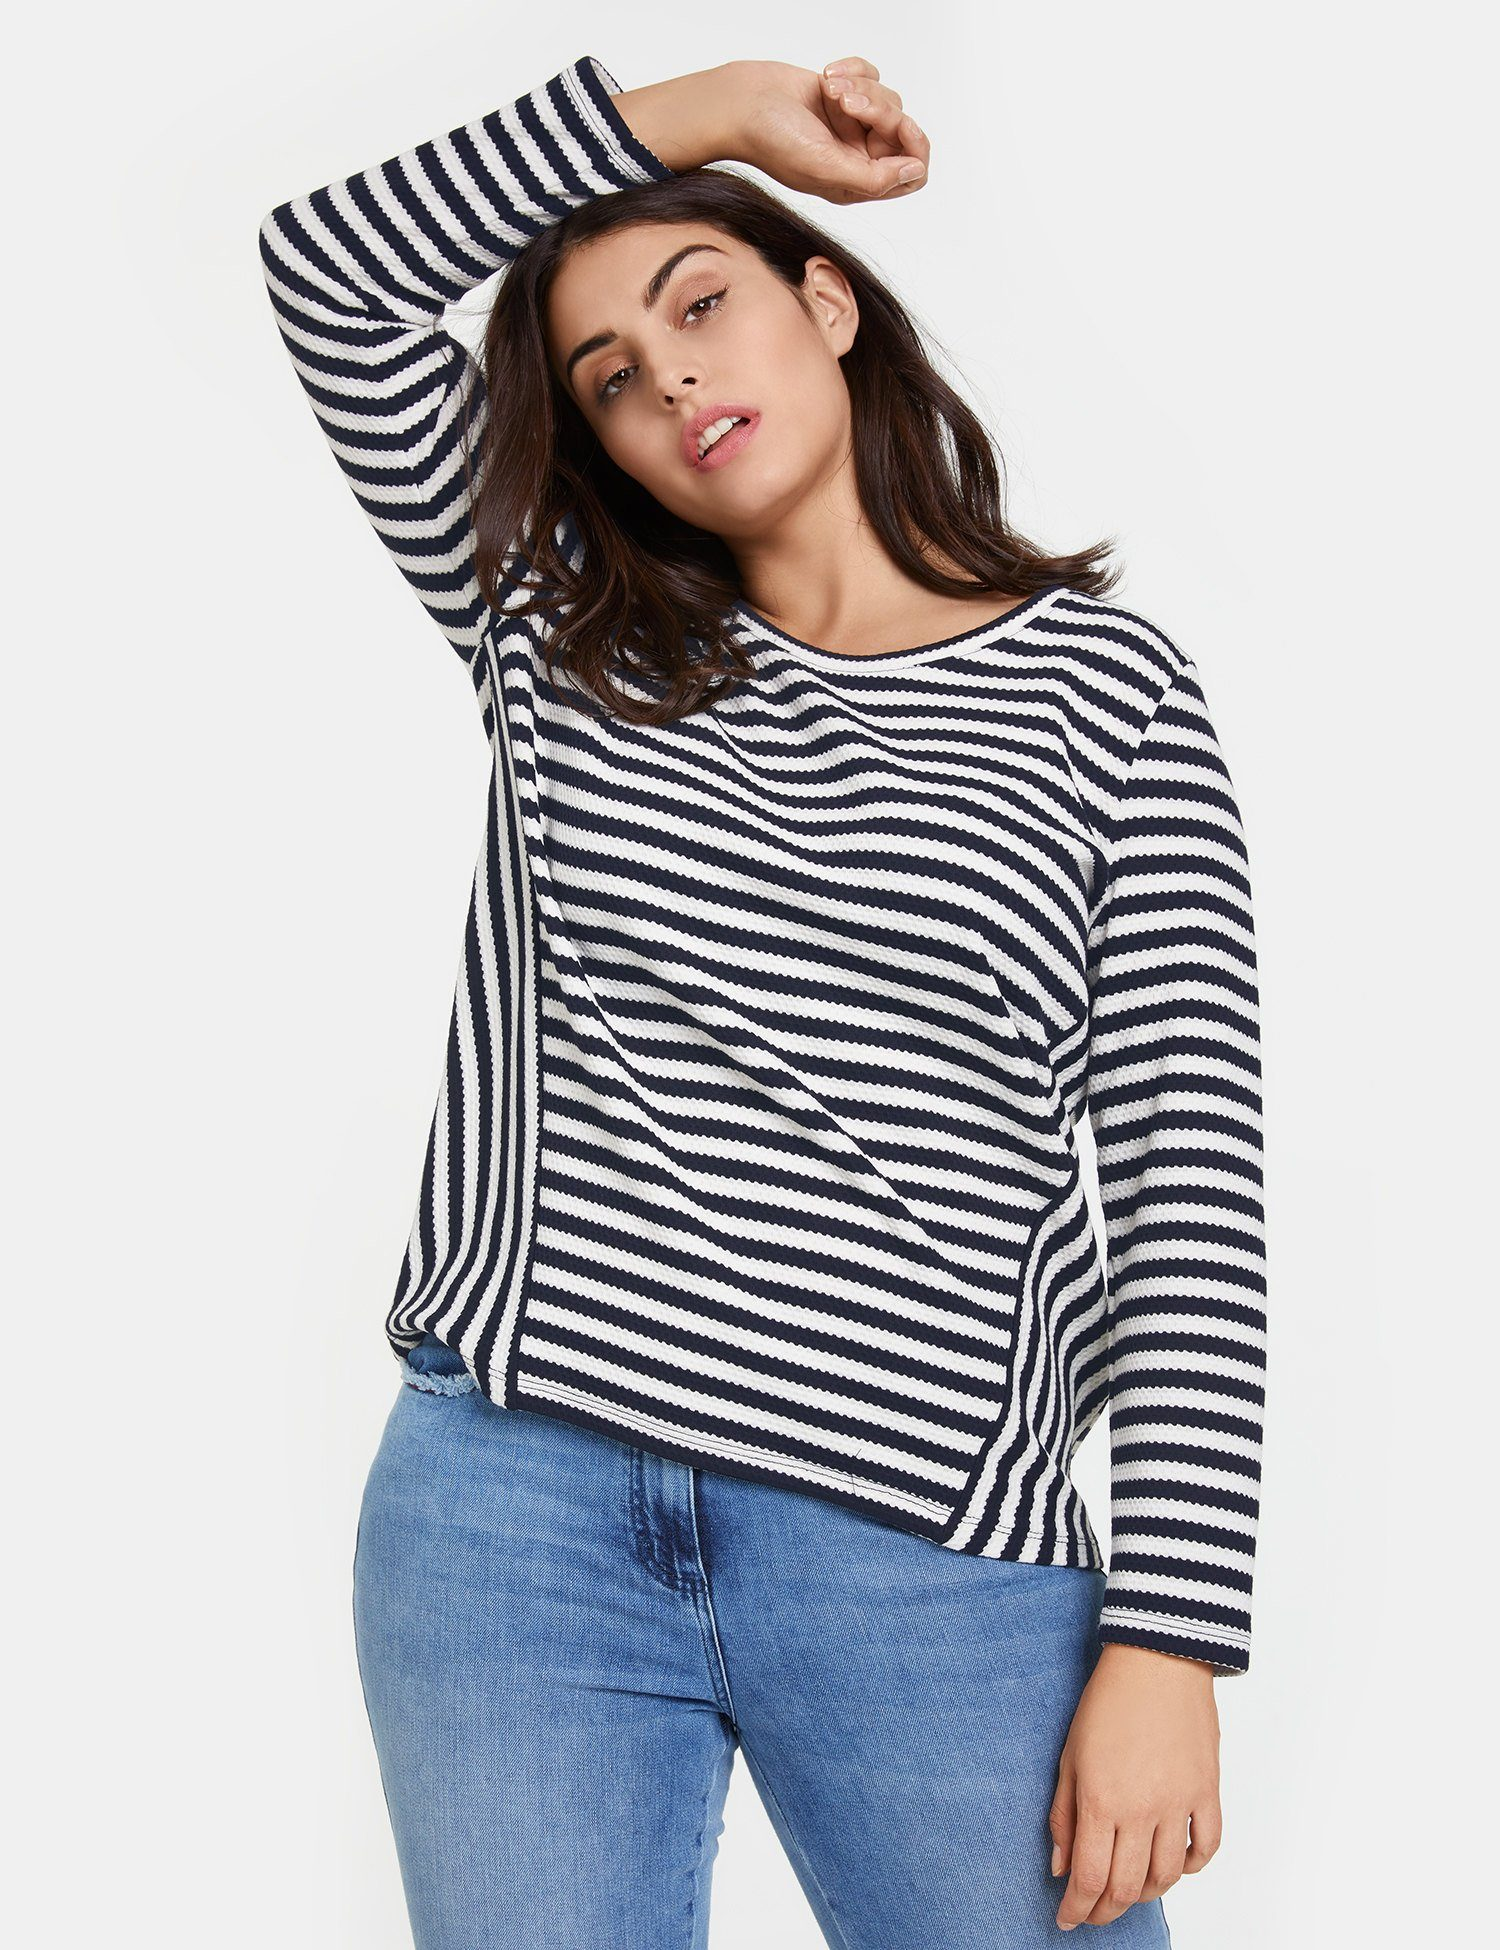 samoon -  T-Shirt Langarm Rundhals Ringel-Shirt aus Struktur-Jersey